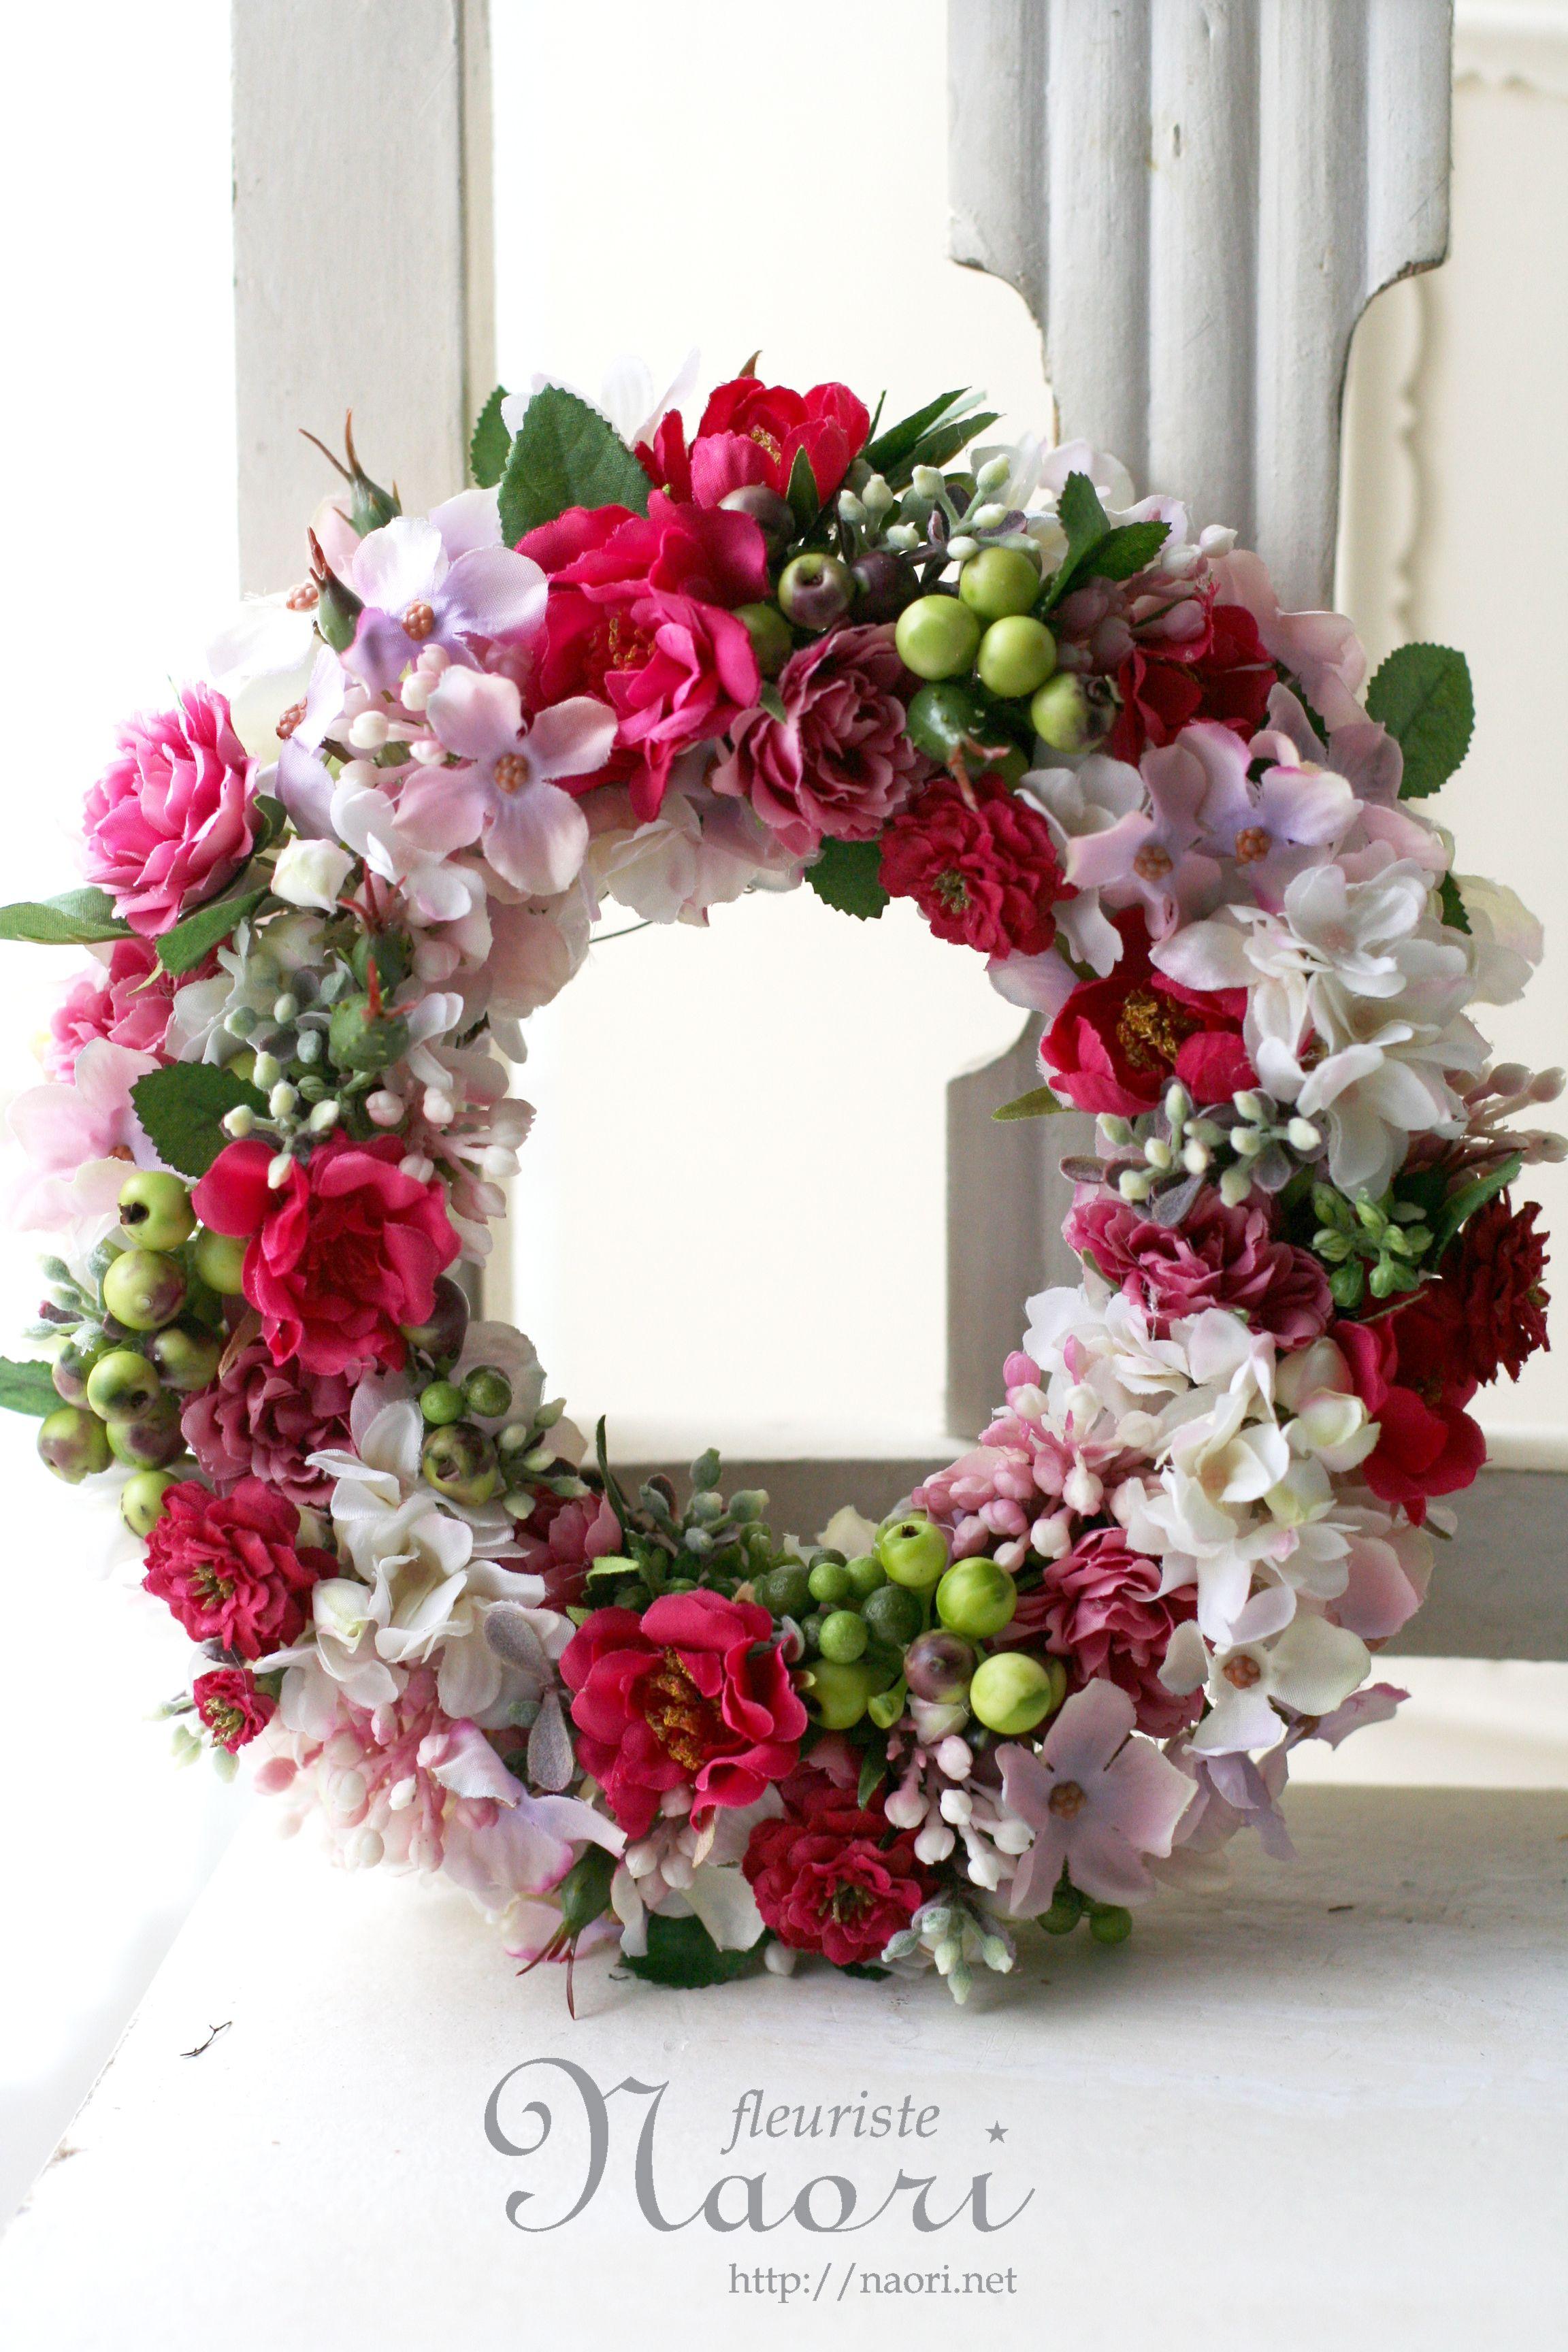 Photo of ス イ ル ド ロ ー ズ と ラ イ ラ ッ ク の リ ー ス Rose Wreath